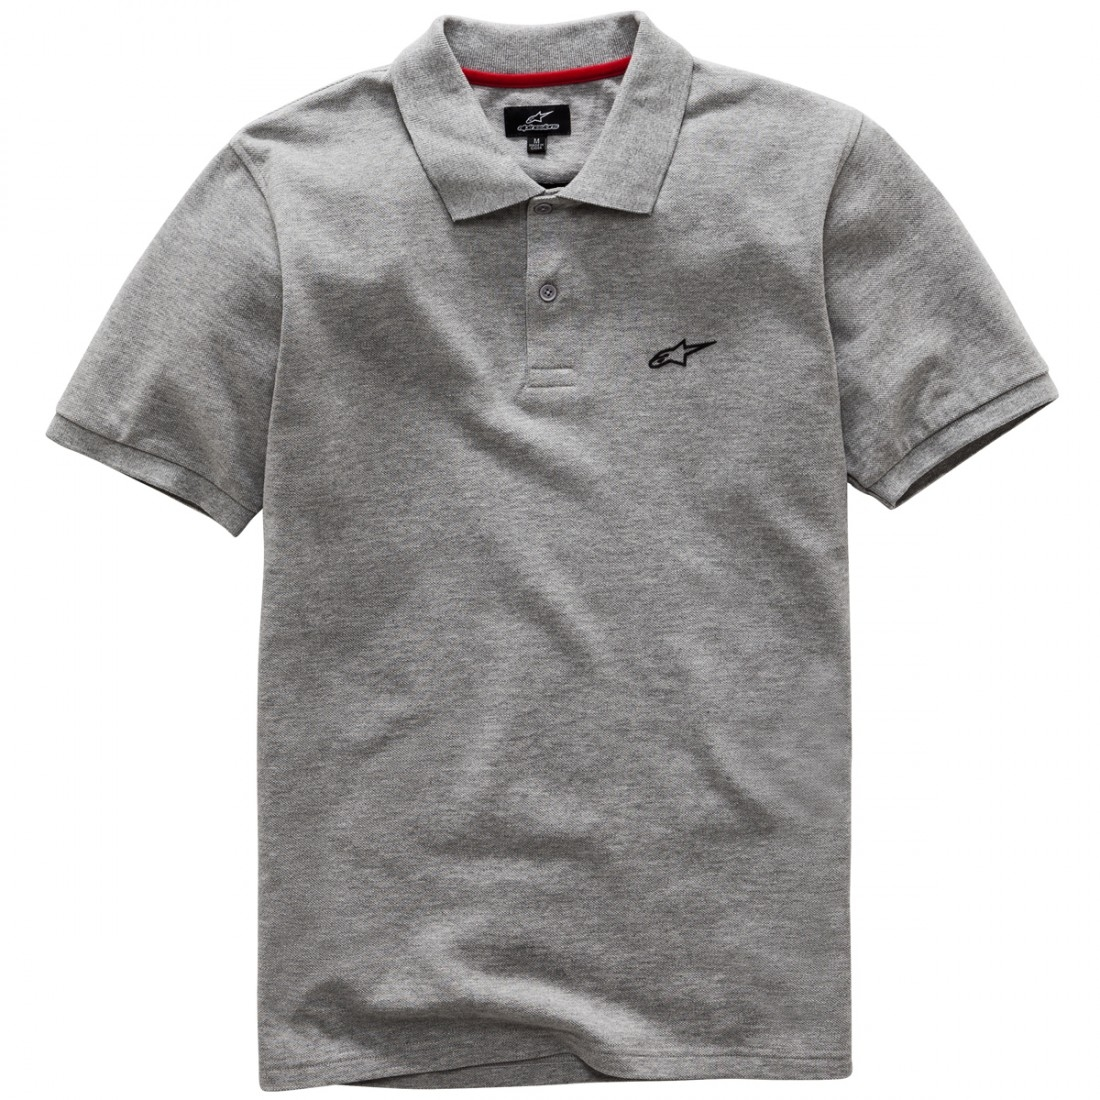 90fba93e ALPINESTARS Effortless Grey Jersey · Motocard